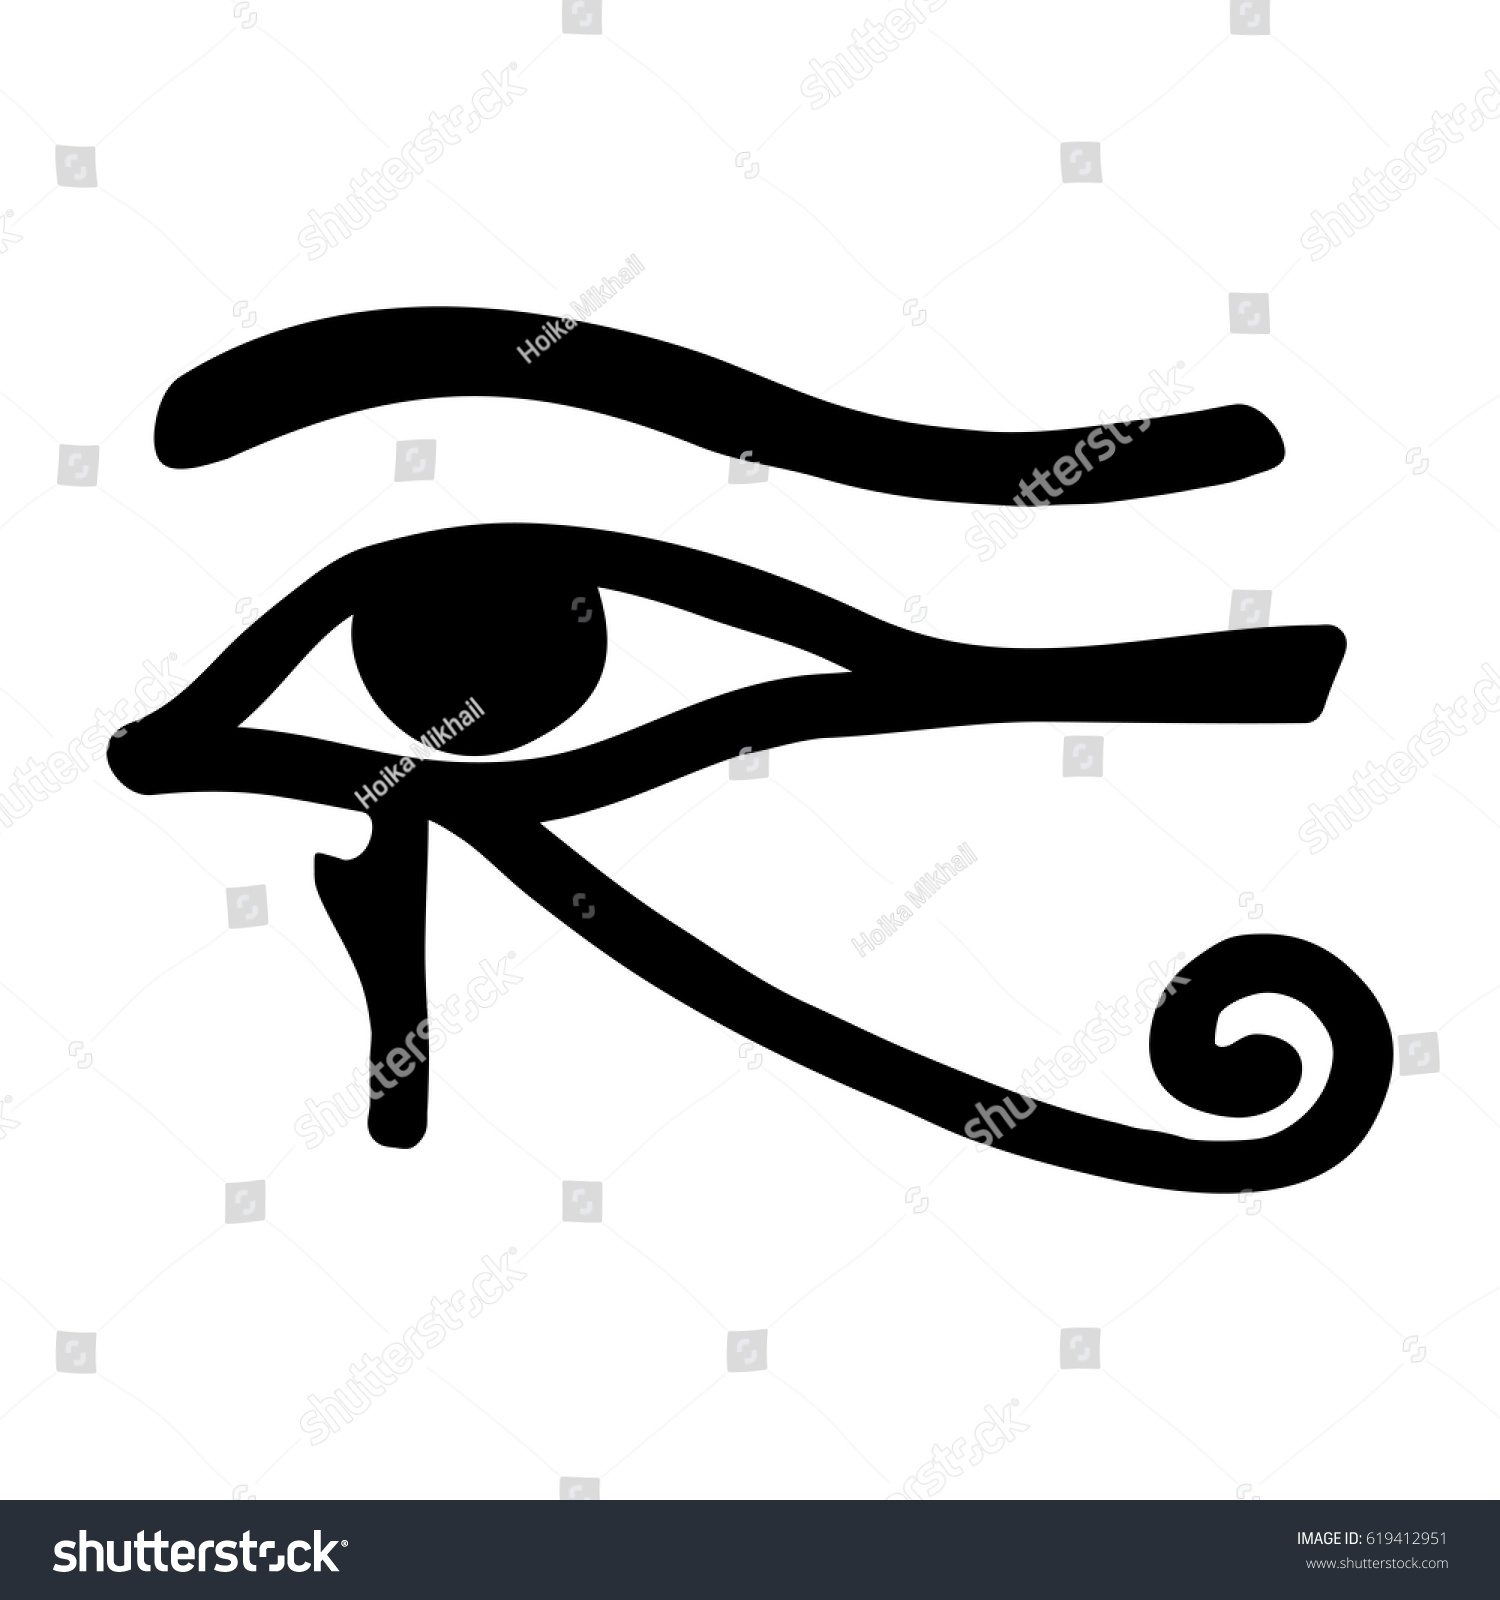 Royalty Free Egyptian Symbol Of The Eyes God Ra 619412951 Stock